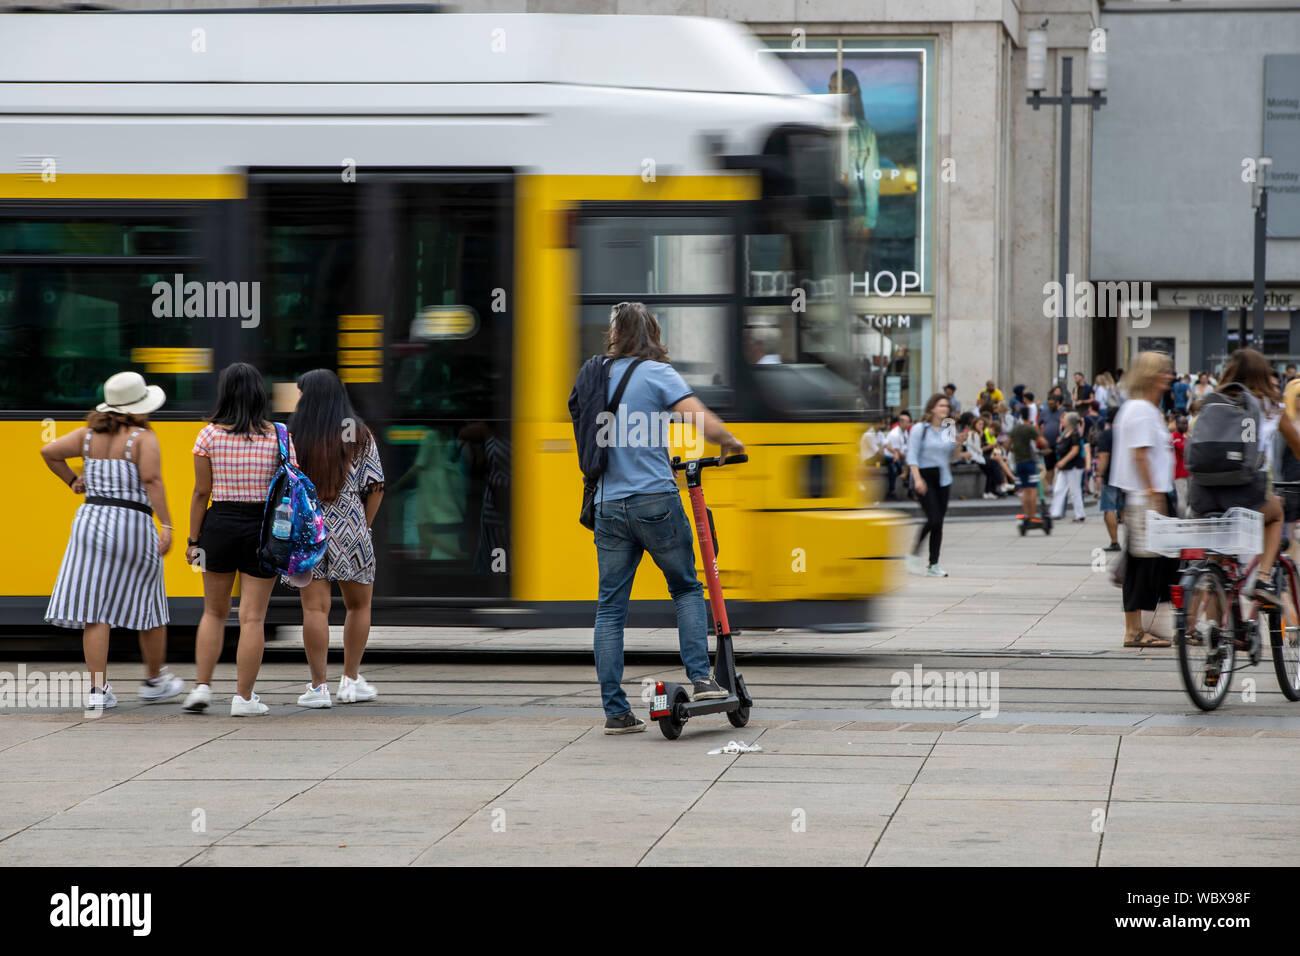 Alexanderplatz, Haltestelle am Strassenbahn, Bahnhof, Passanten, Berlin, Stock Photo